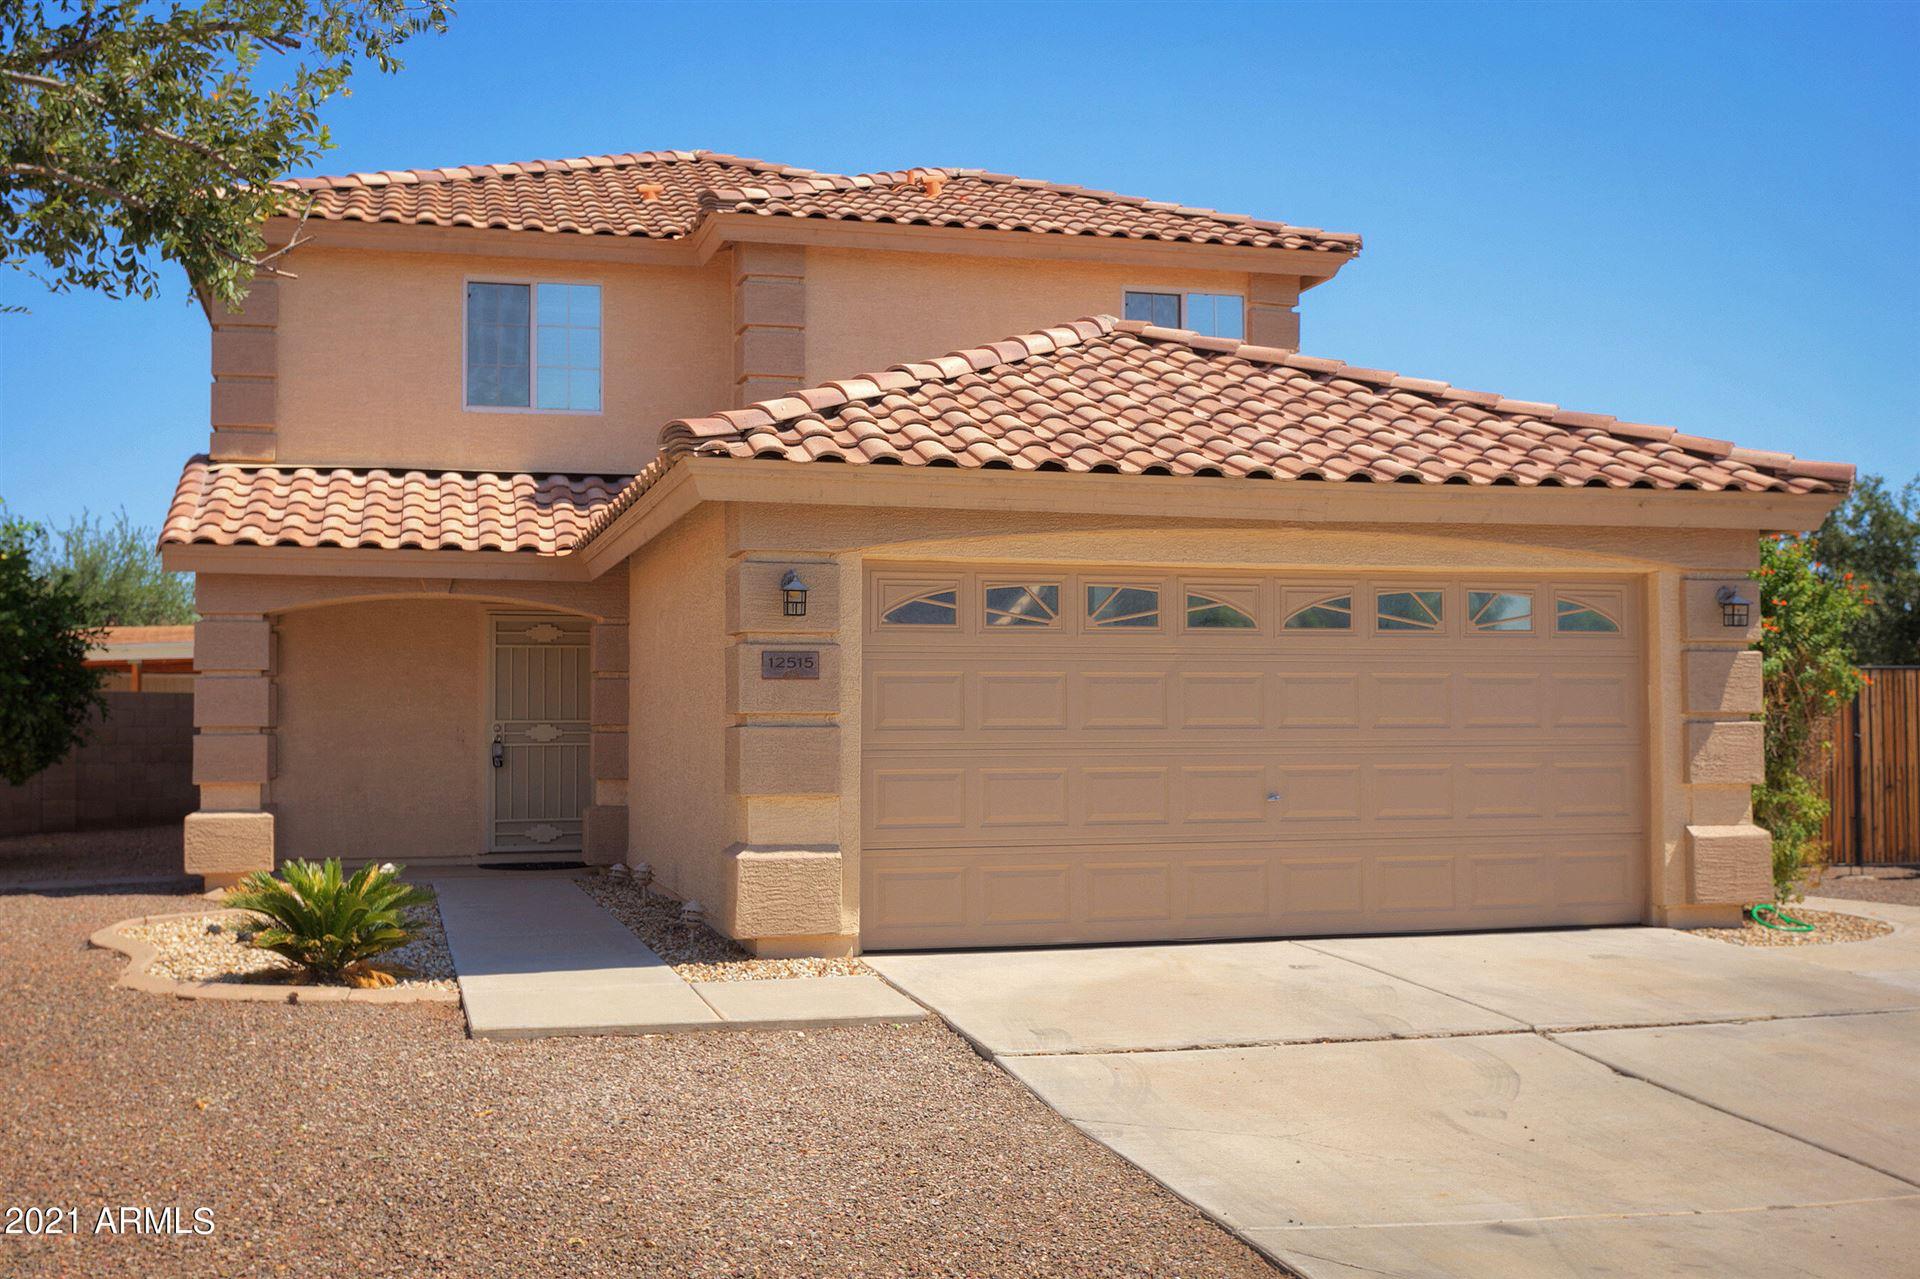 Photo of 12515 N 121ST Drive, El Mirage, AZ 85335 (MLS # 6290206)